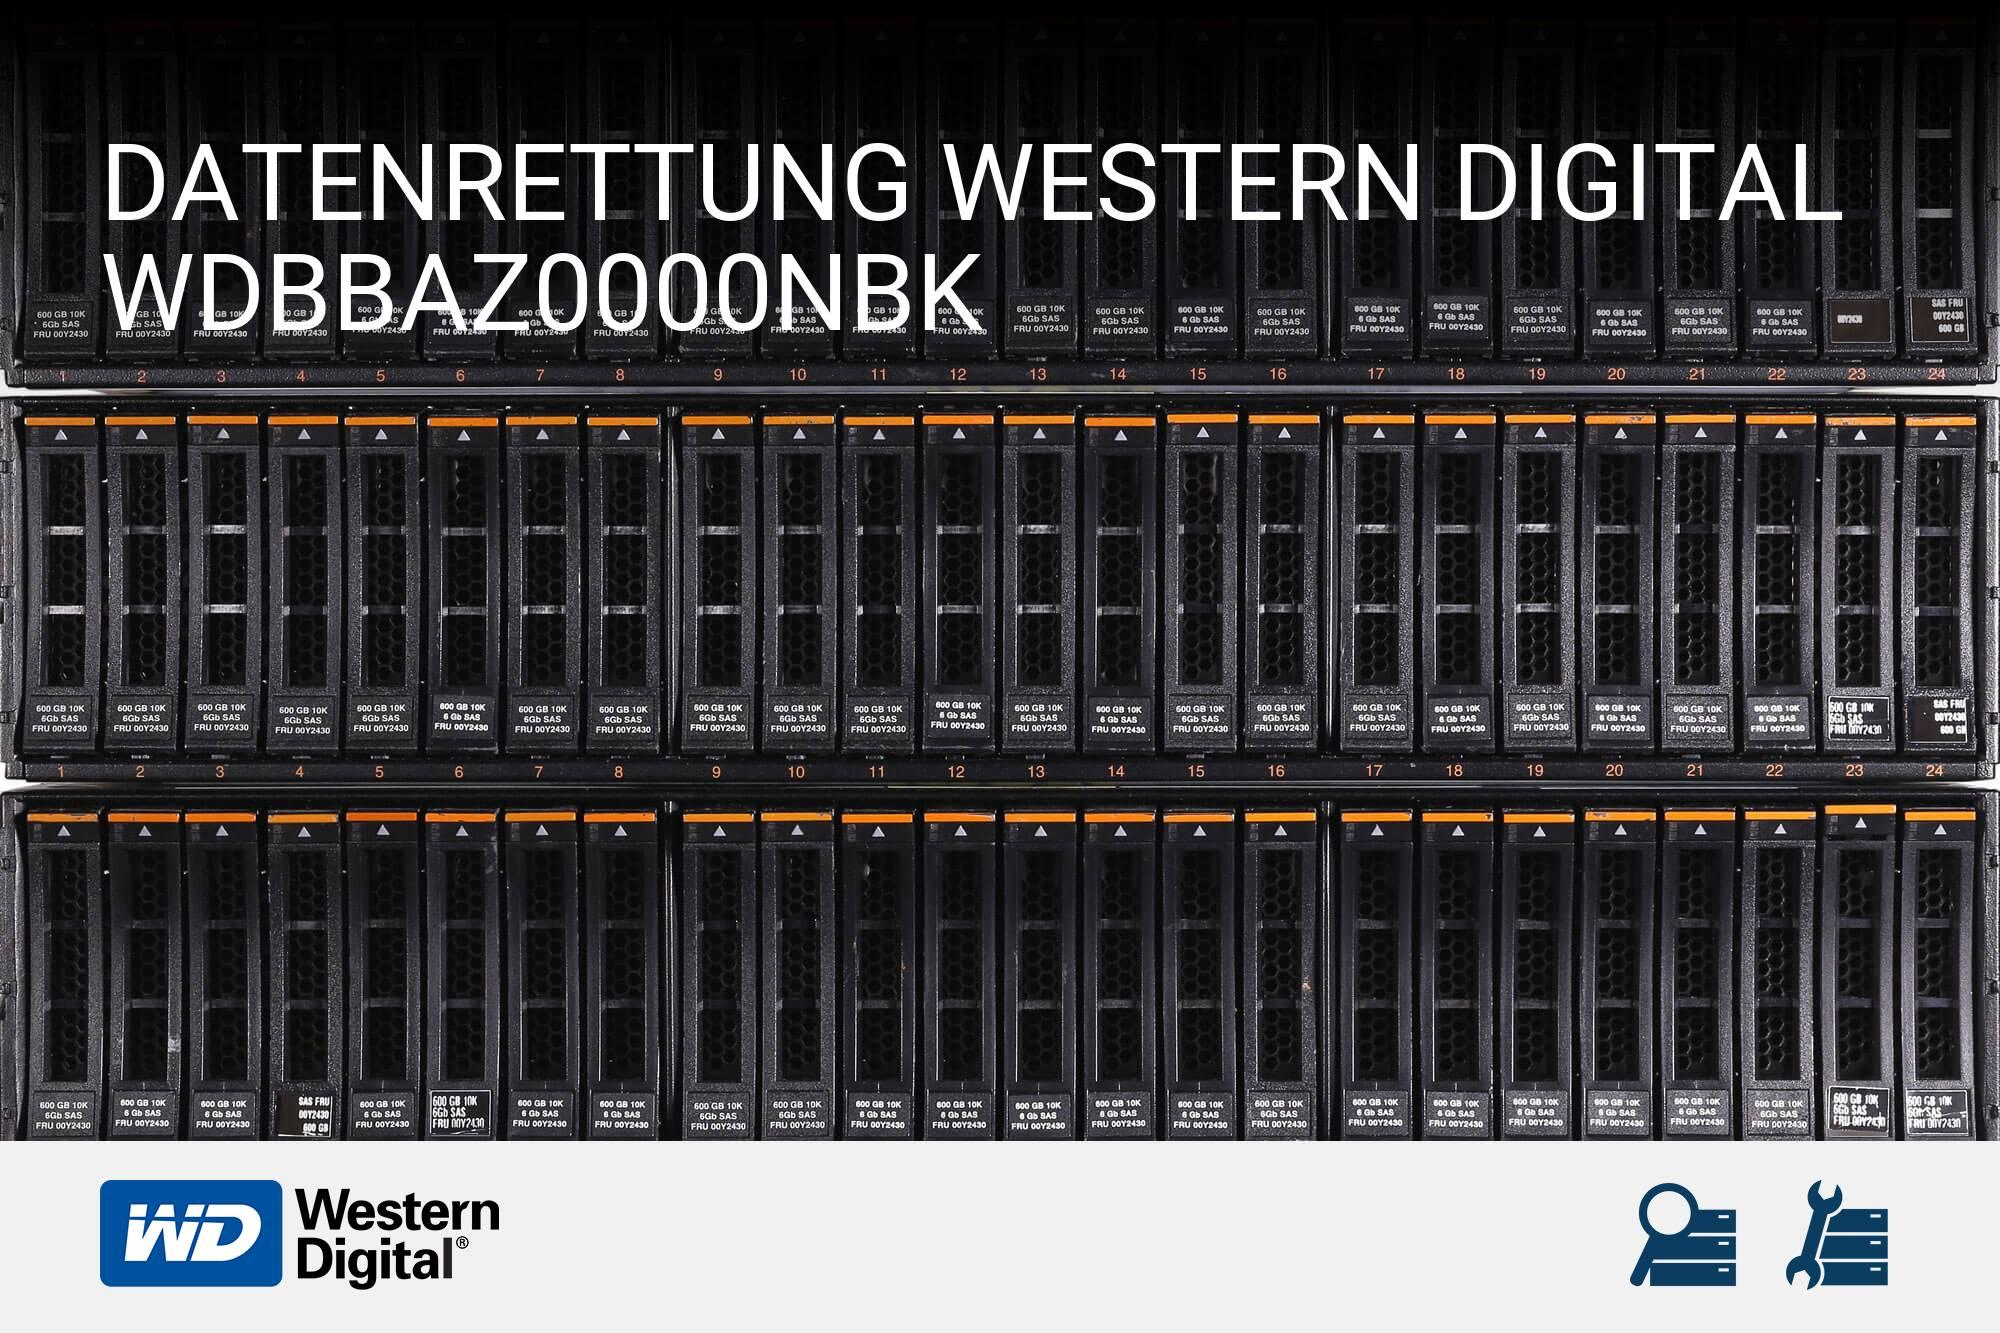 Western Digital WDBBAZ0000NBK